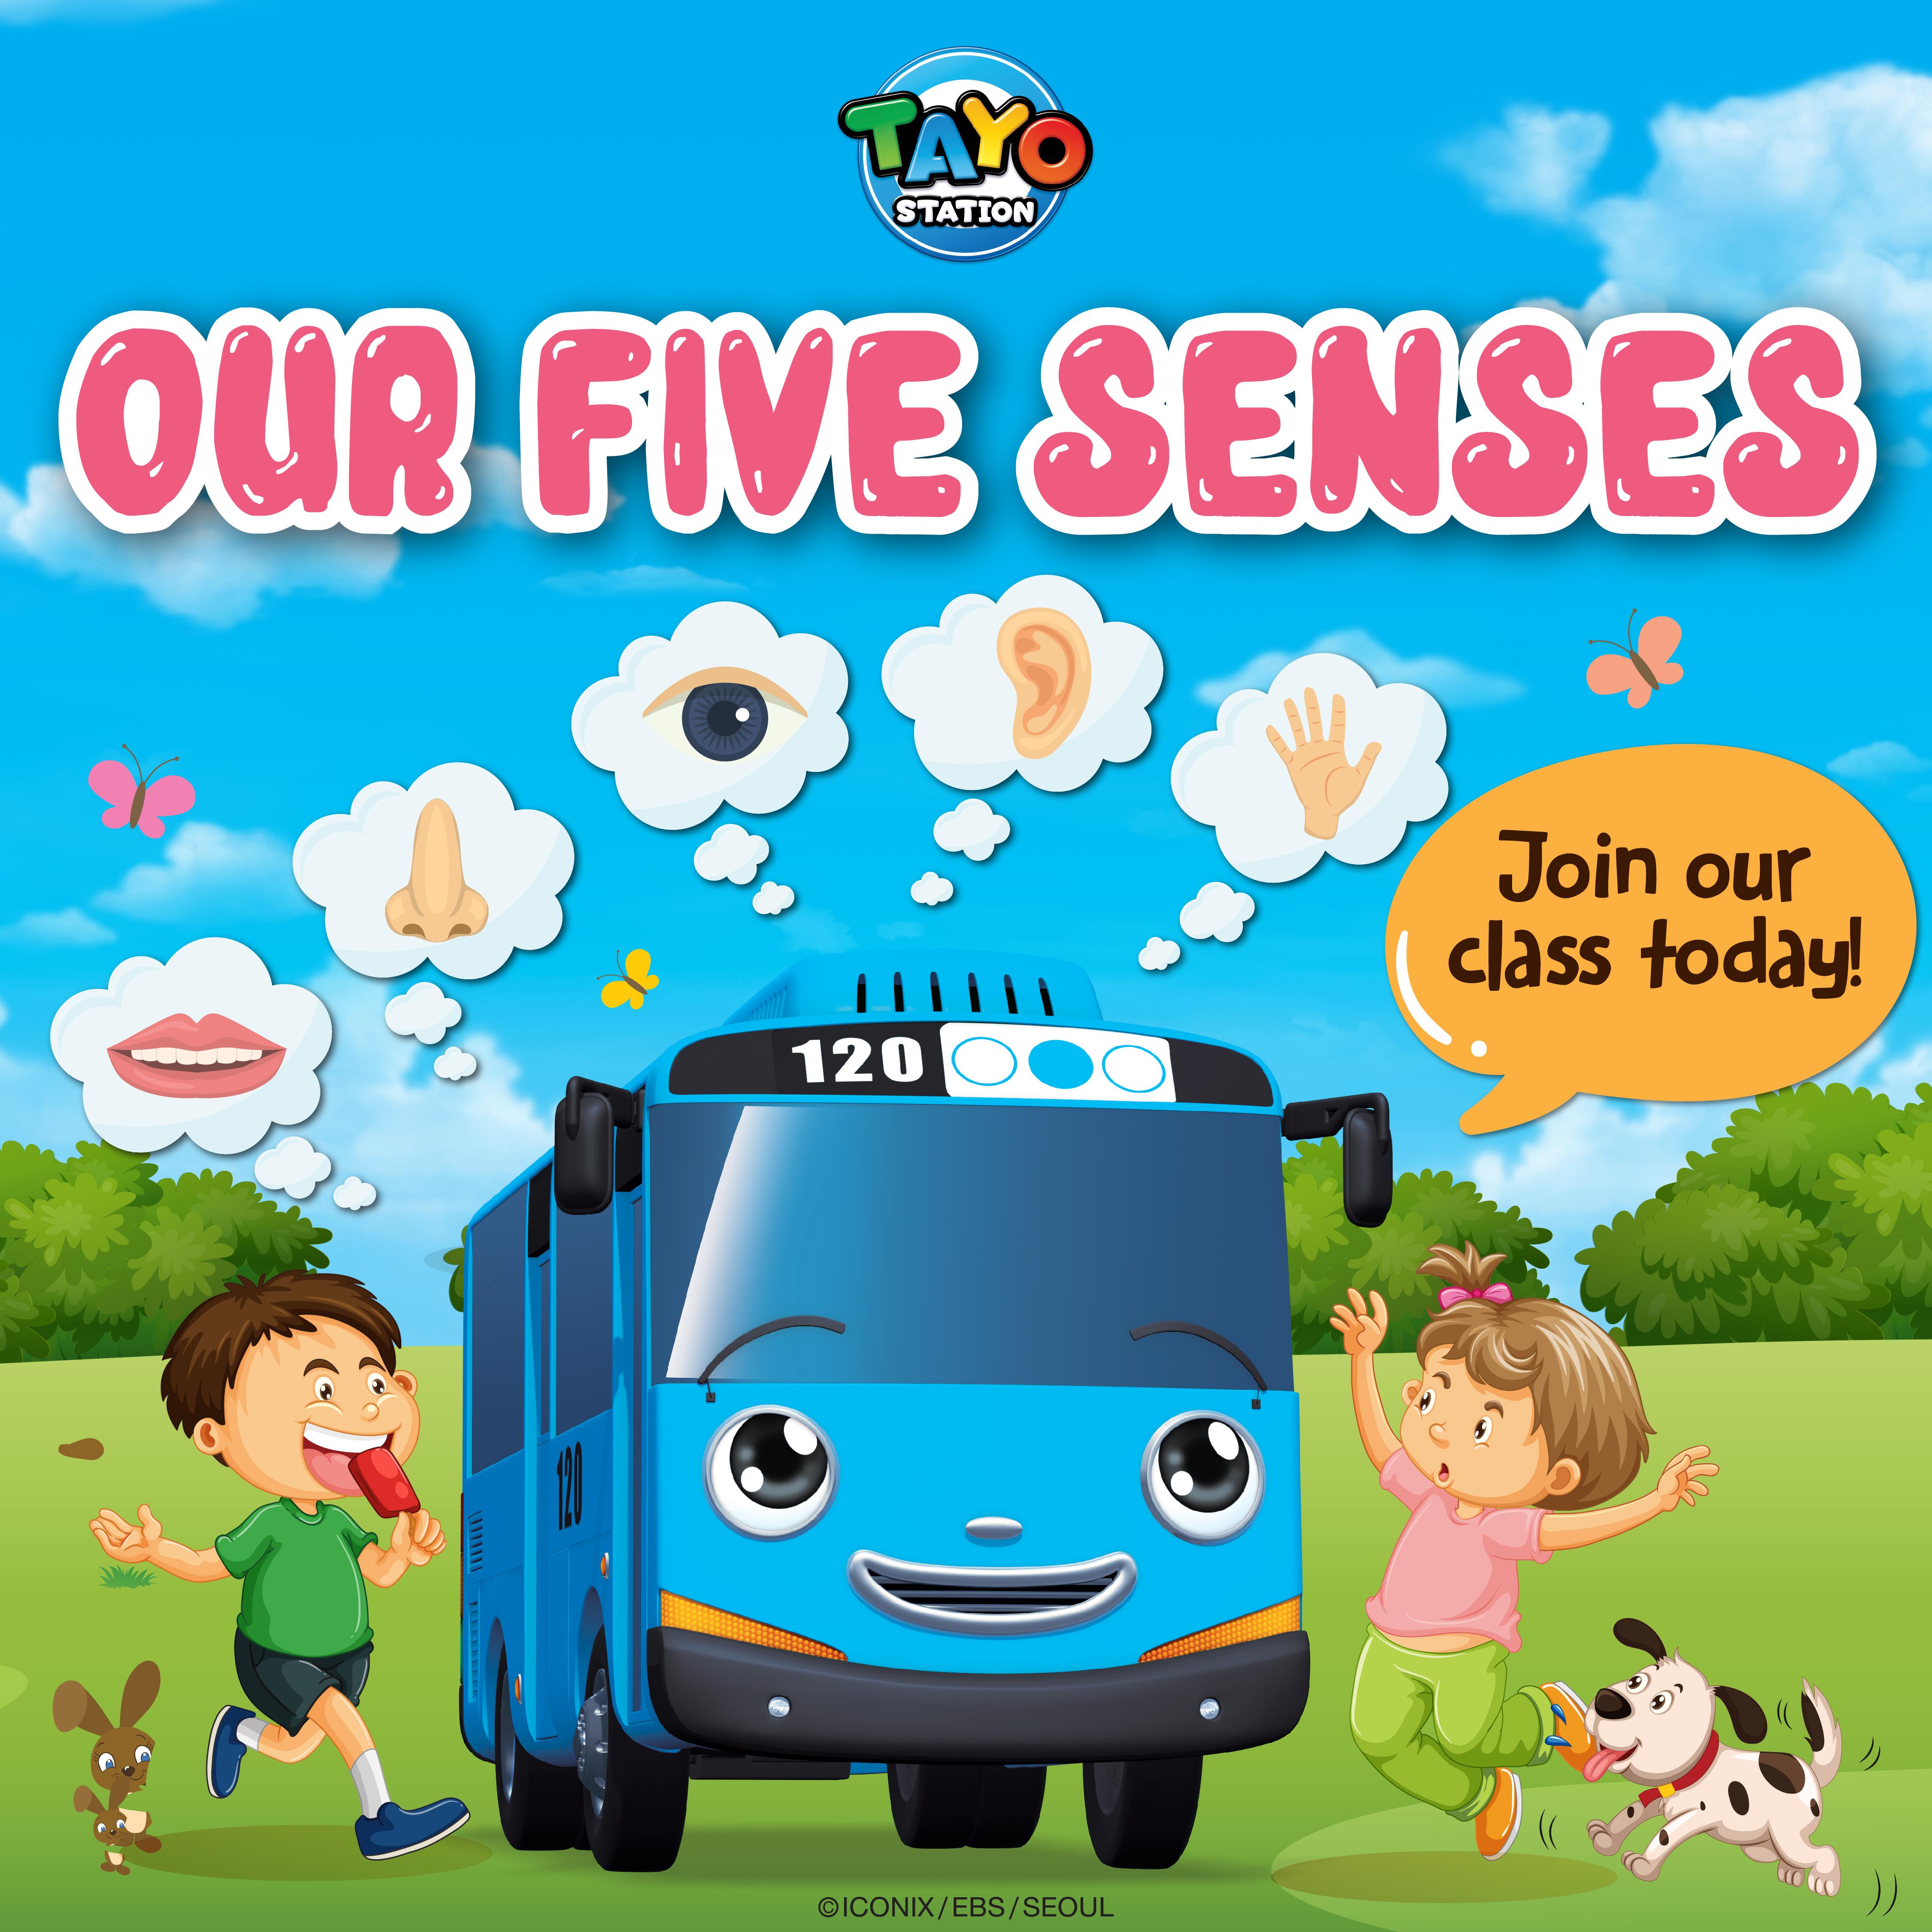 Tayo Sense Class  | Tayo Station